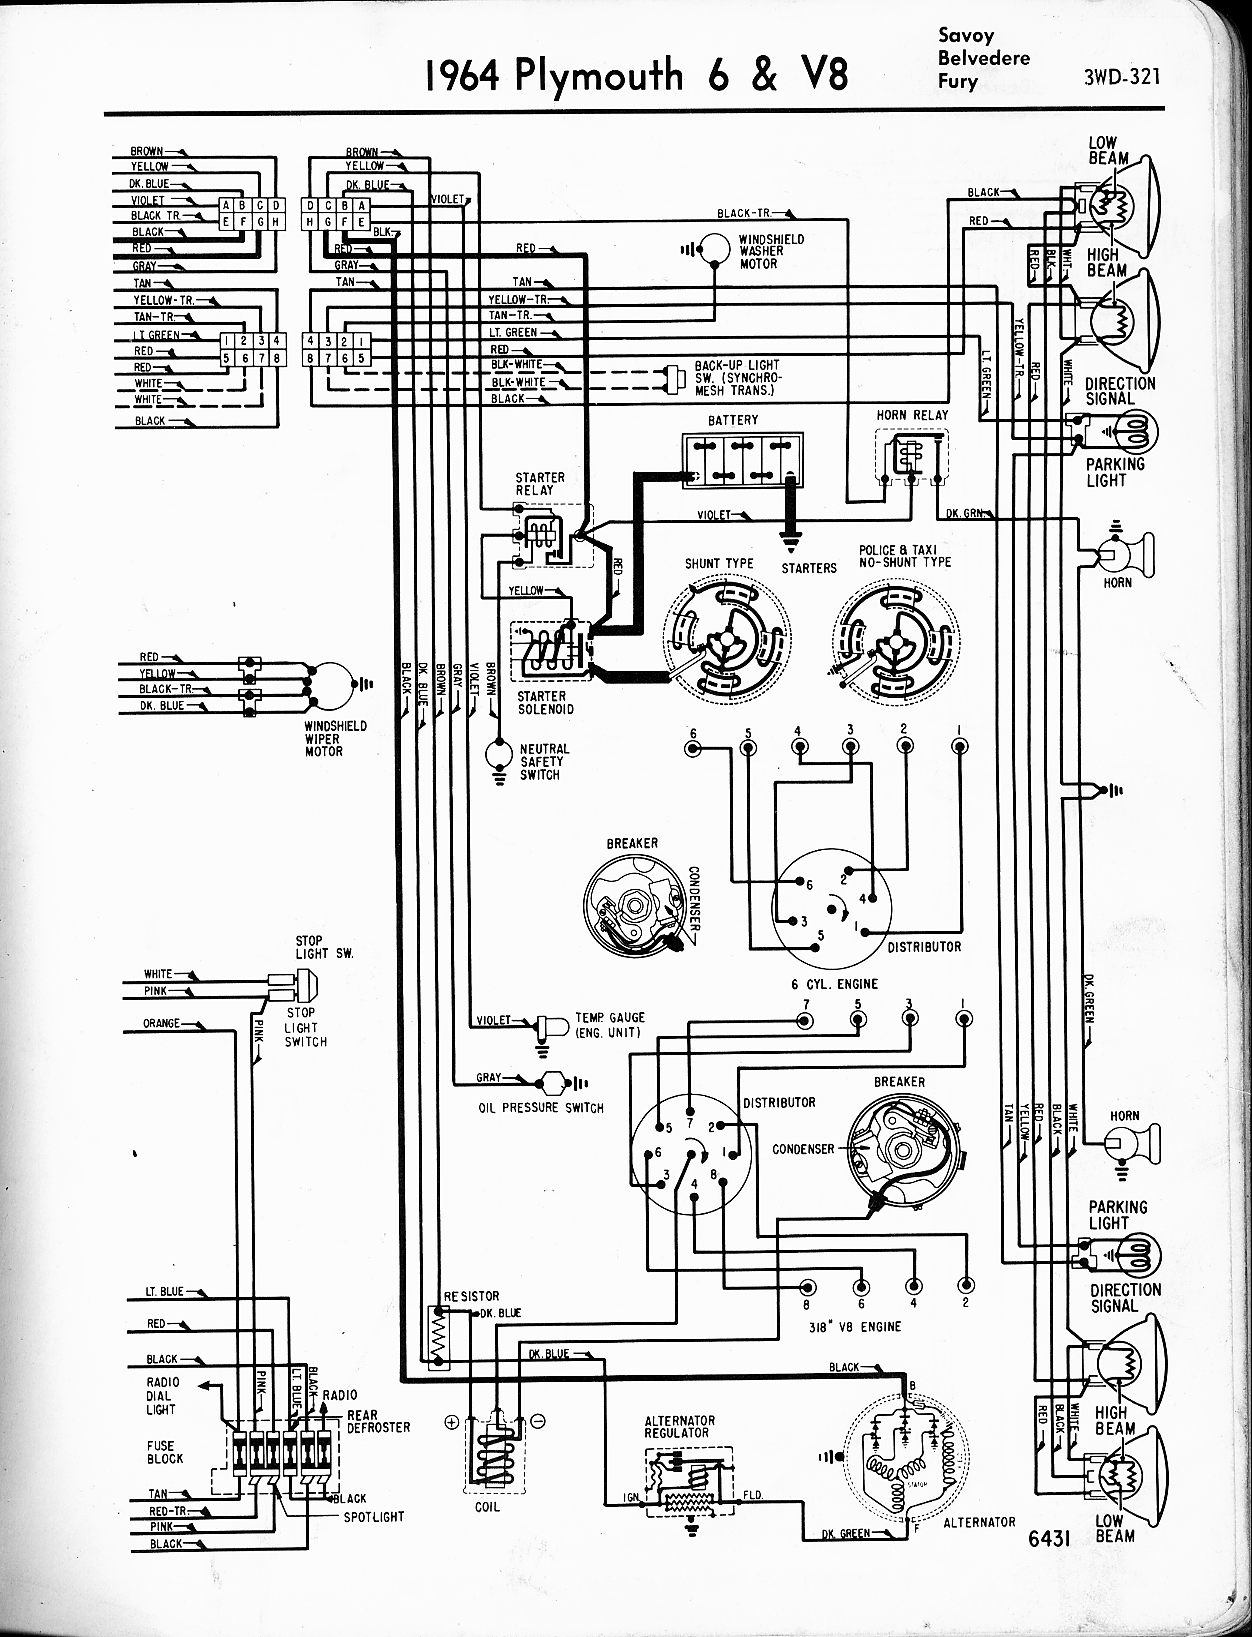 1963 impala alternator wiring diagram e36 rear speaker 1960 plymouth fury get free image